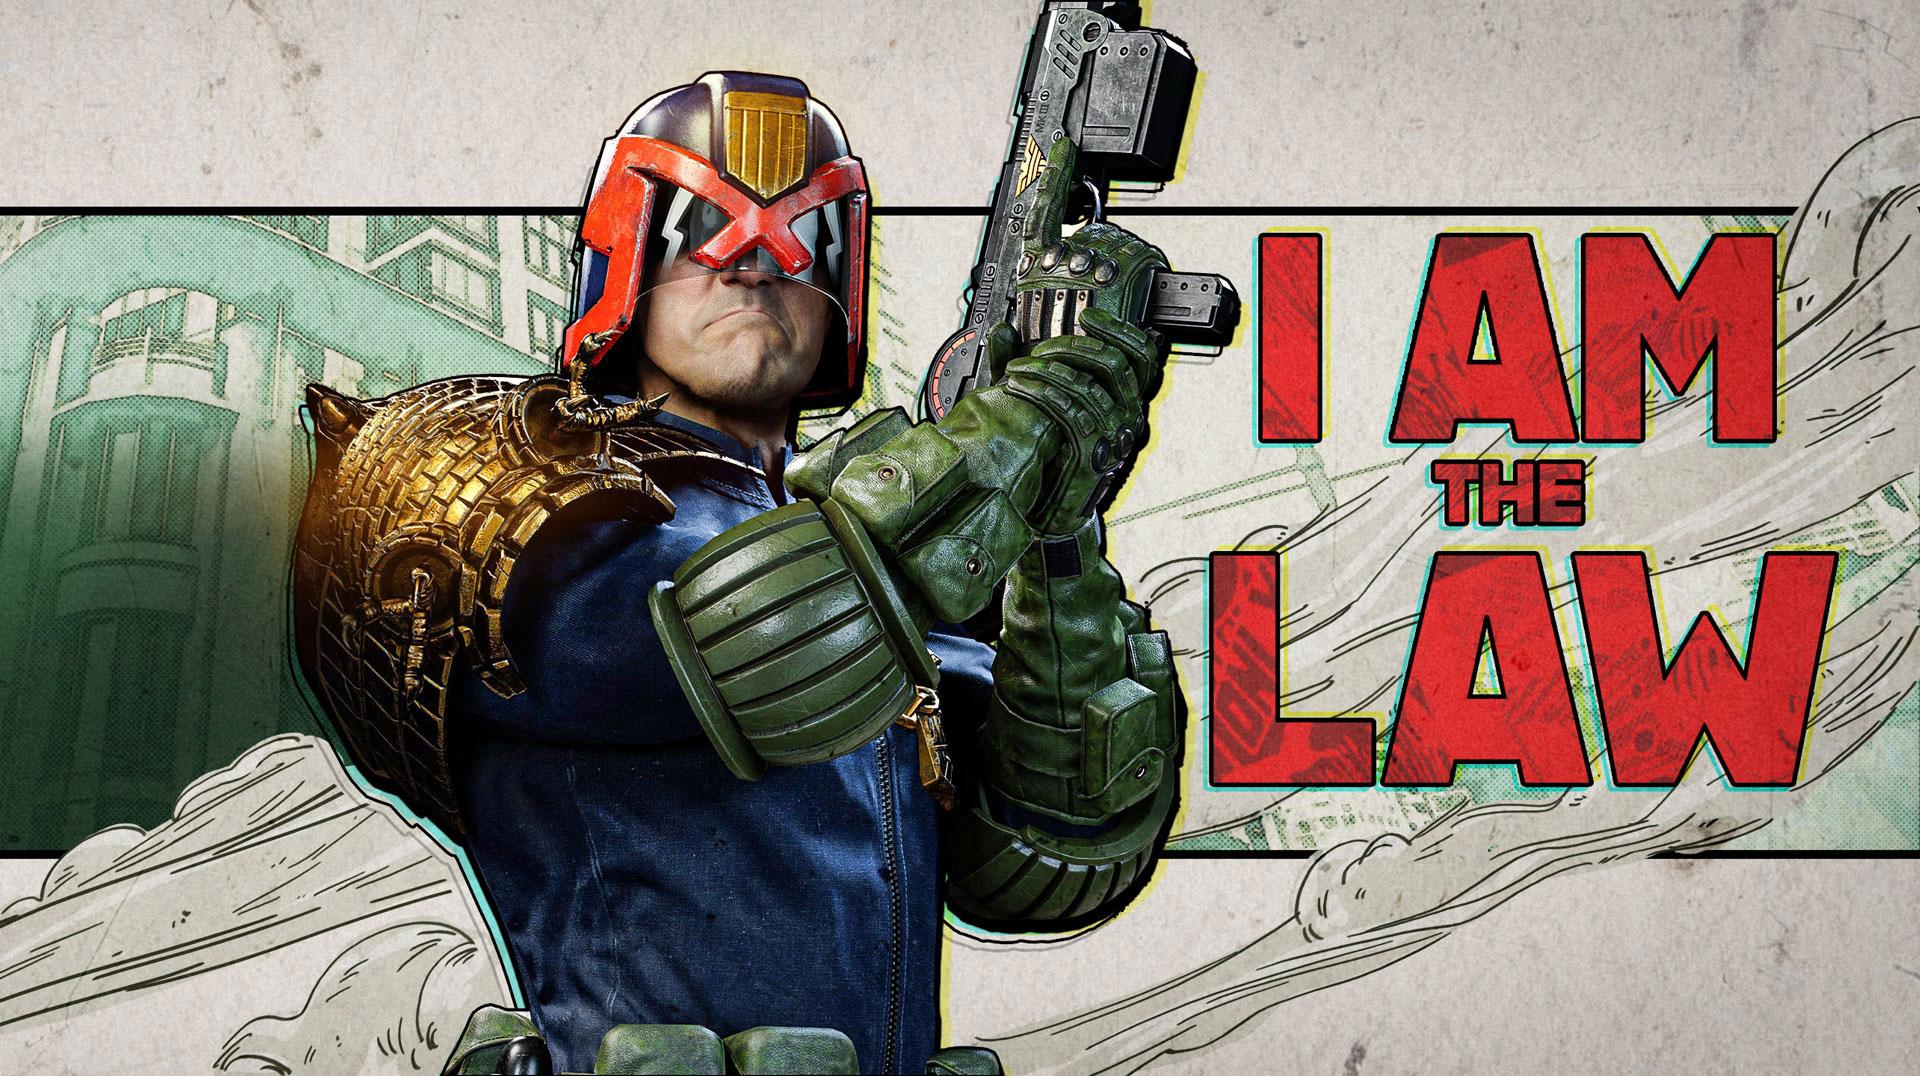 Judge Dredd artwork